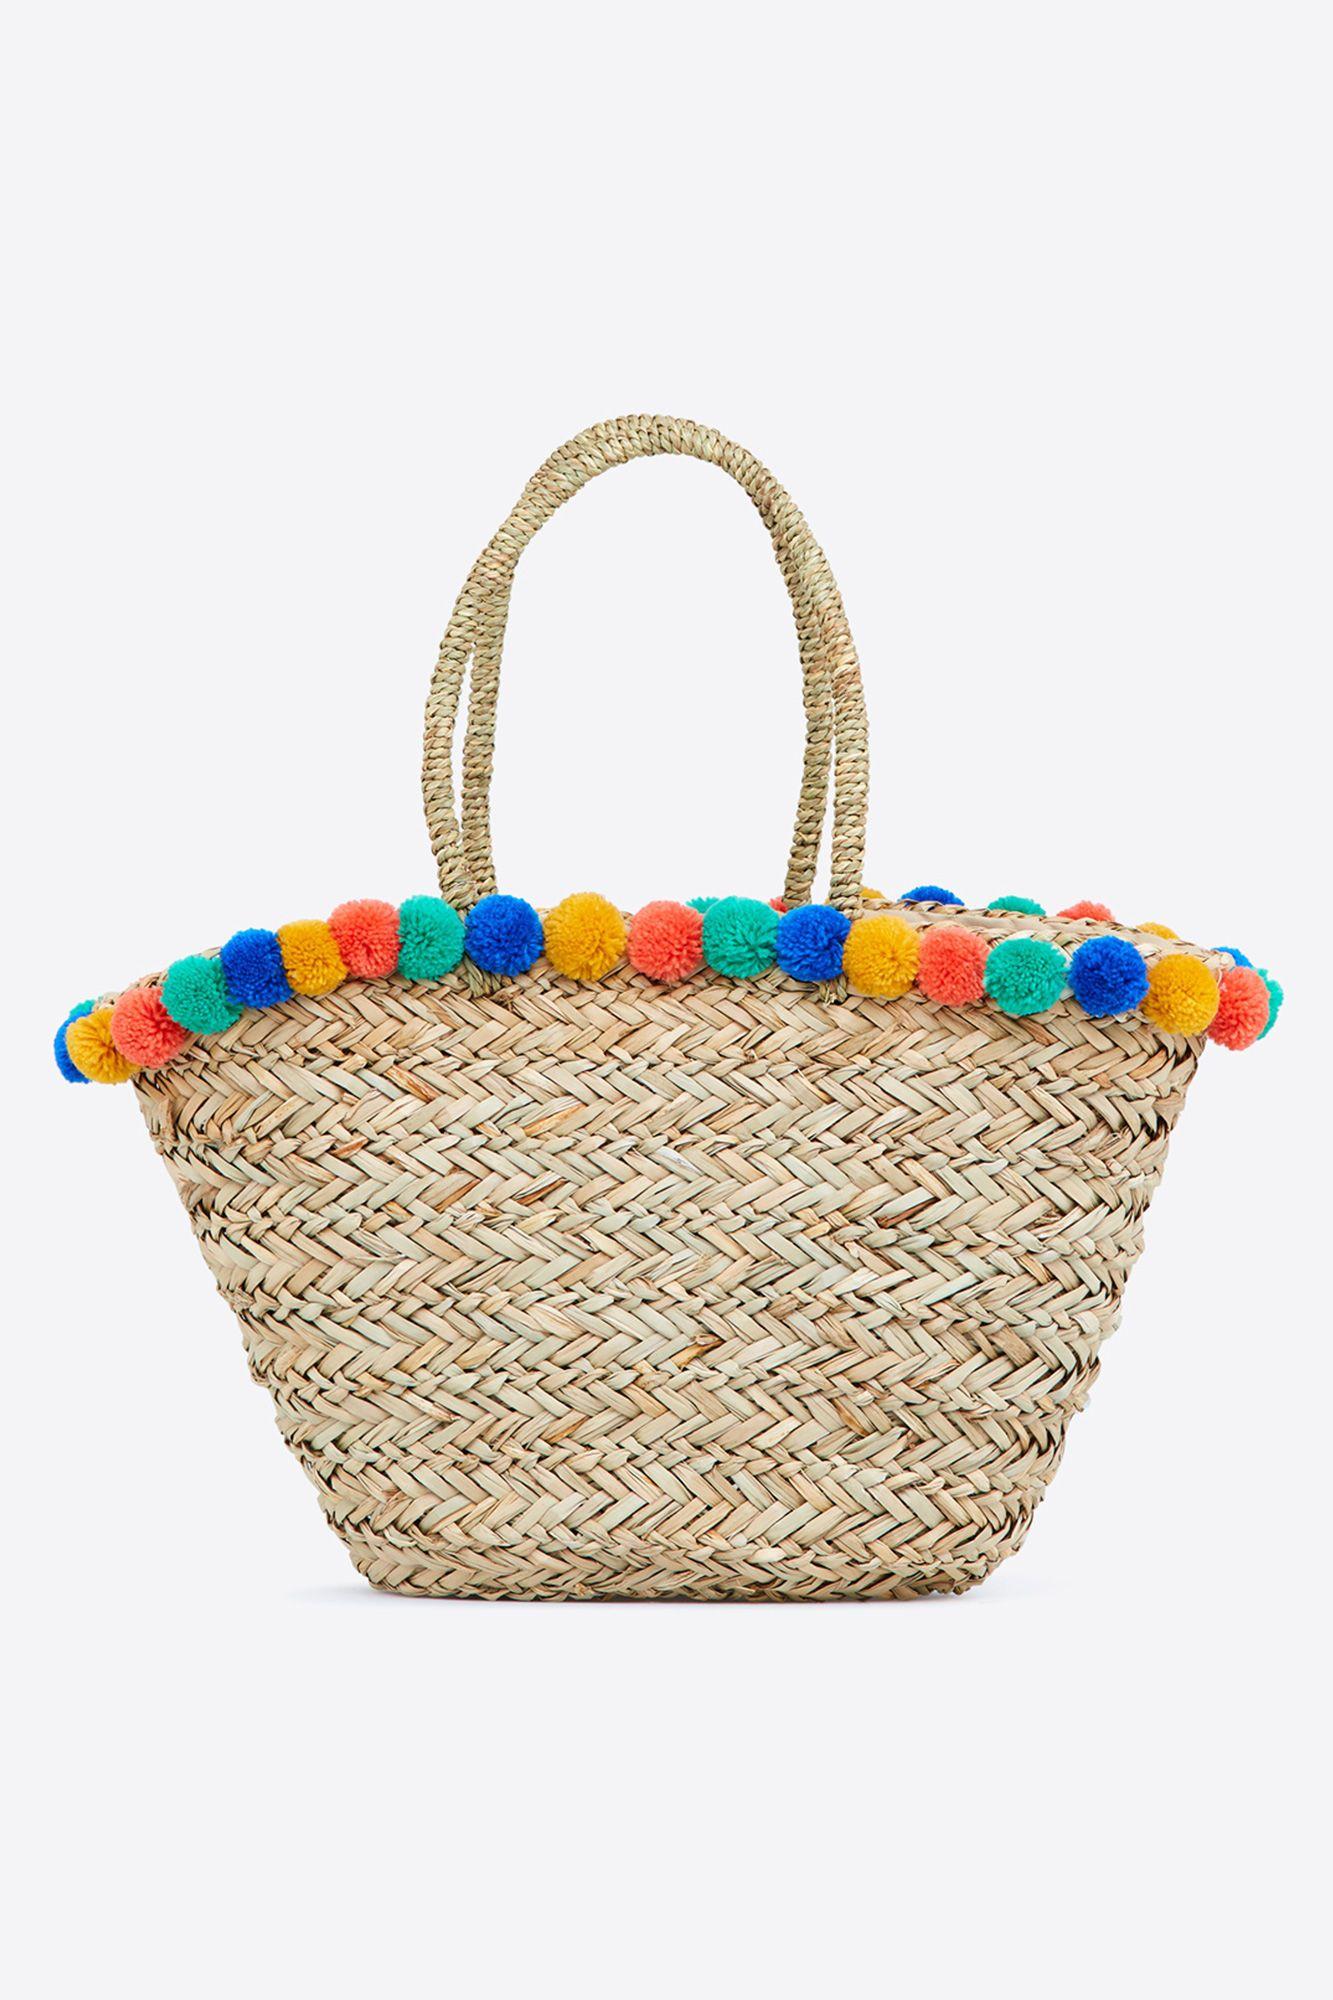 Bolso Capazo De Playa Baño Women Secret Women Accessories Straw Bag Bags